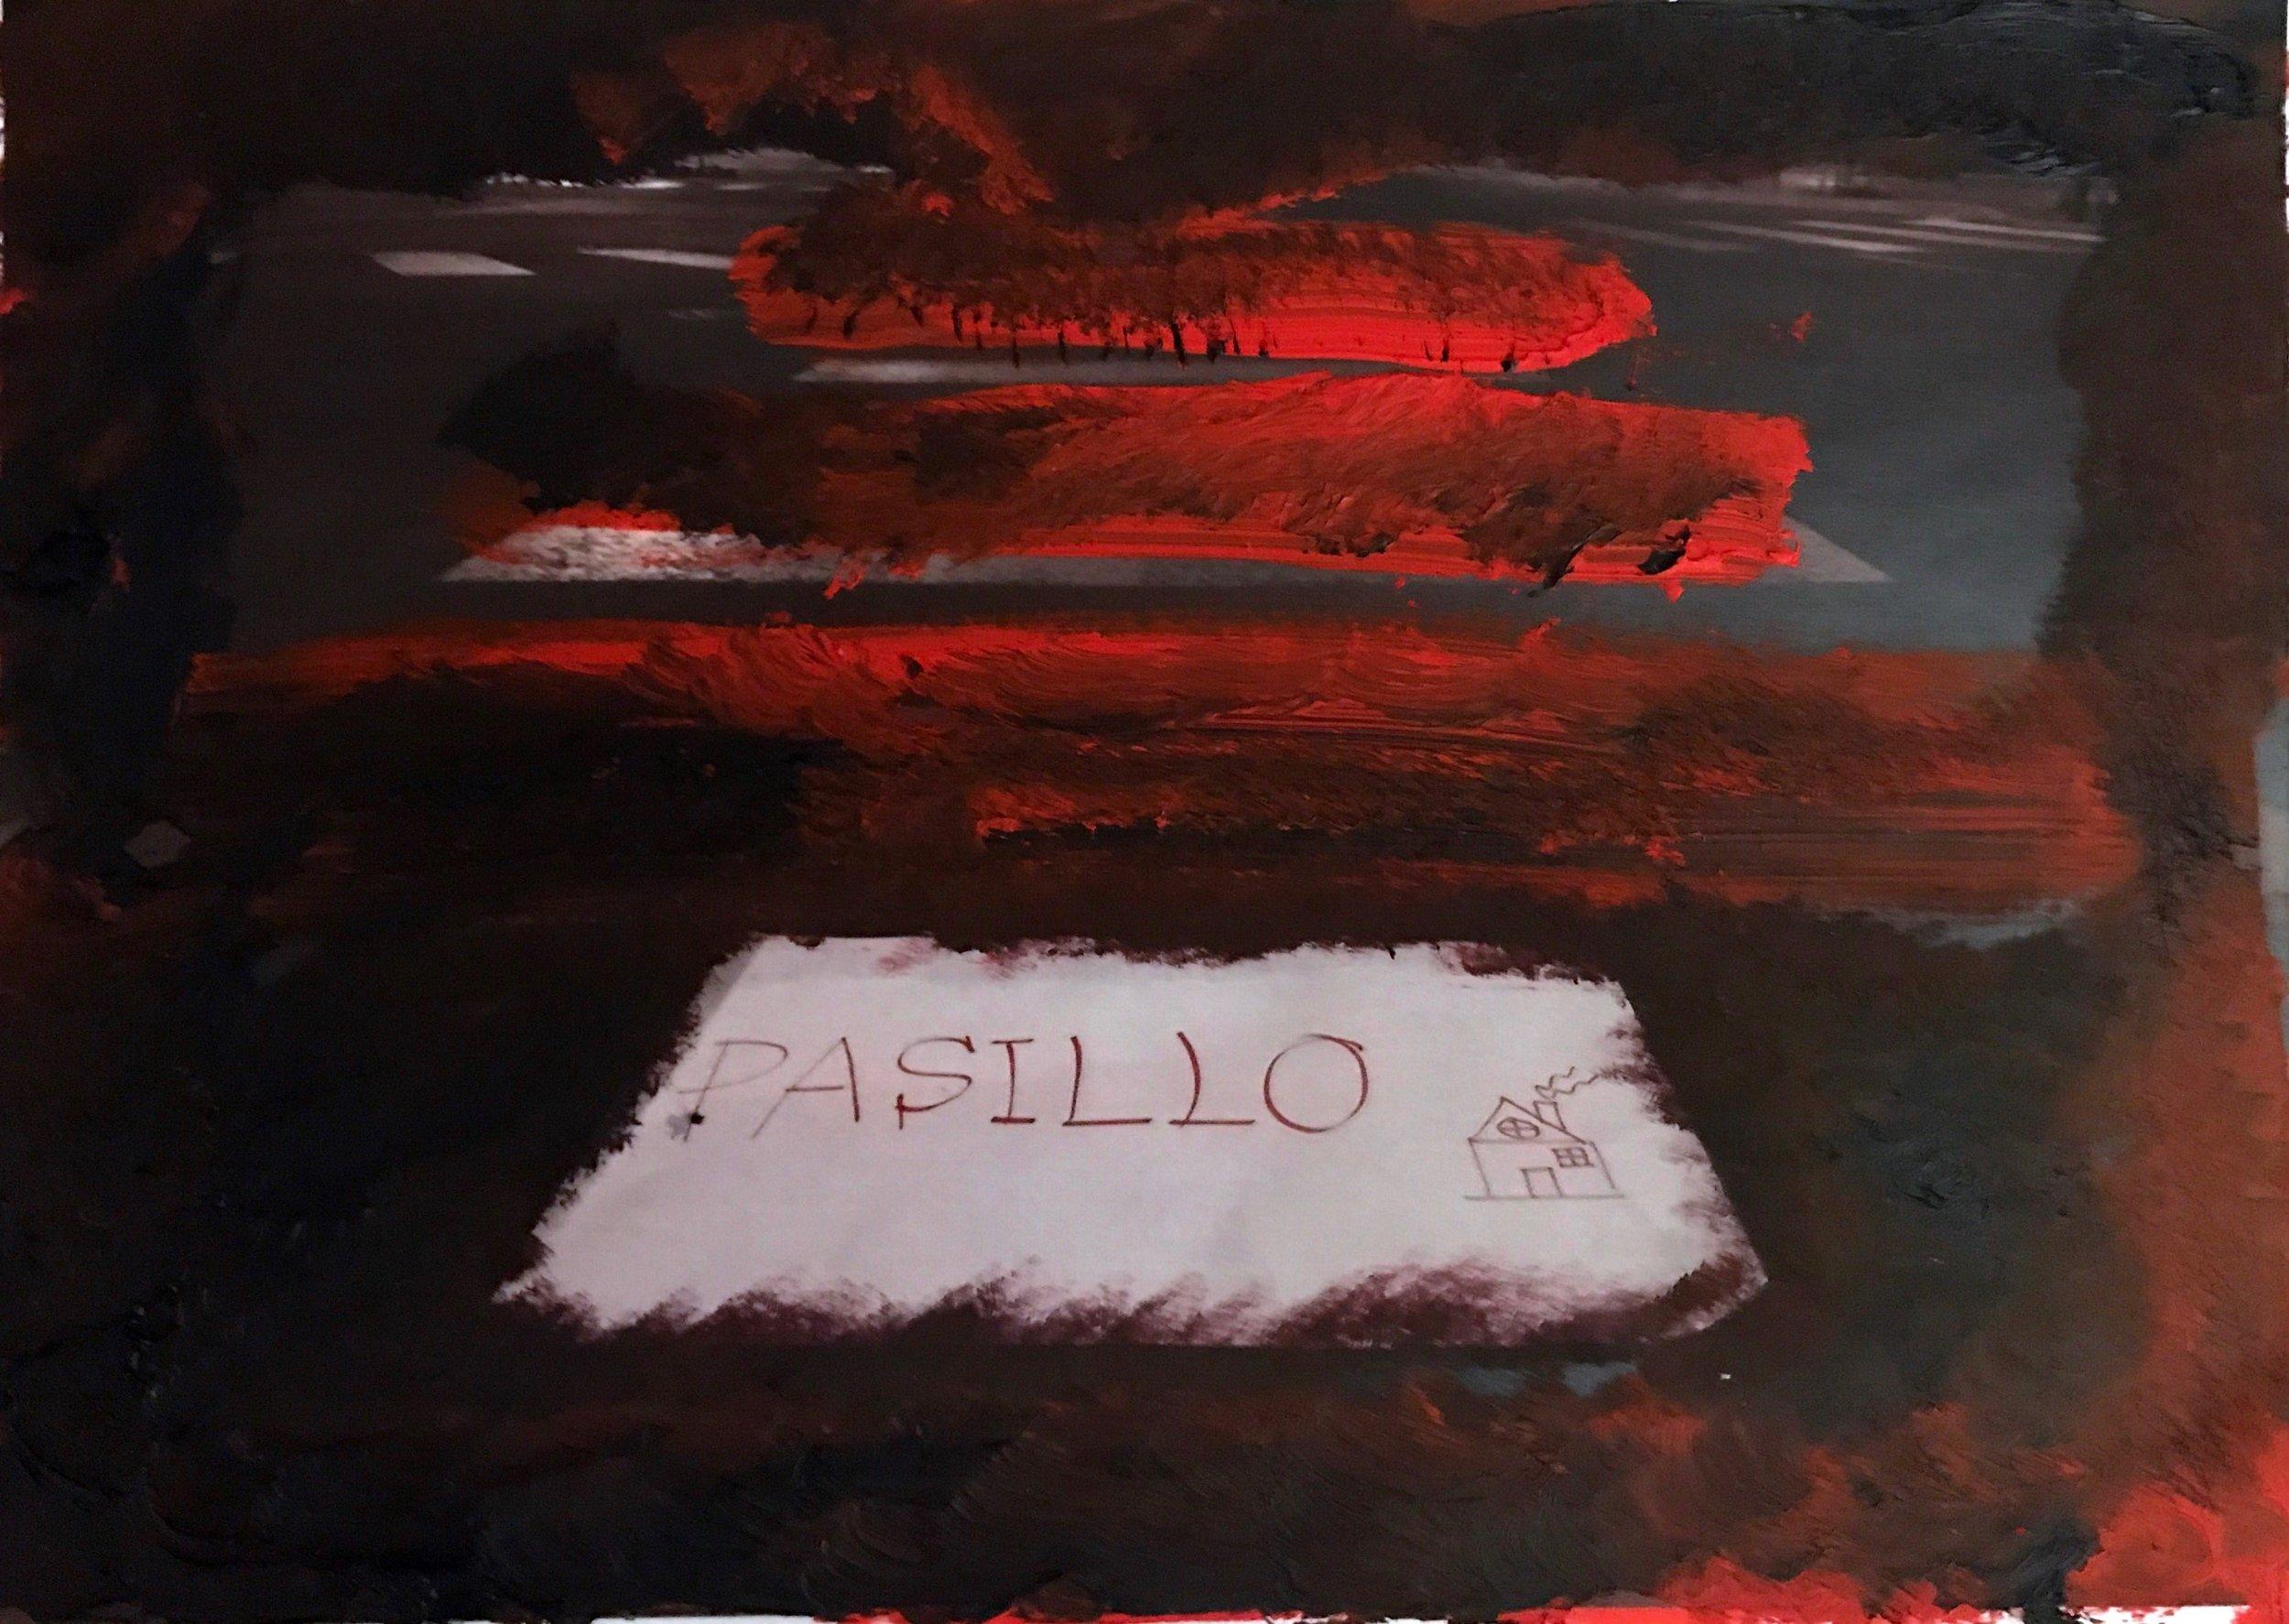 """Pasillo,"" Oil over printed photograph. Madrid, 2019."